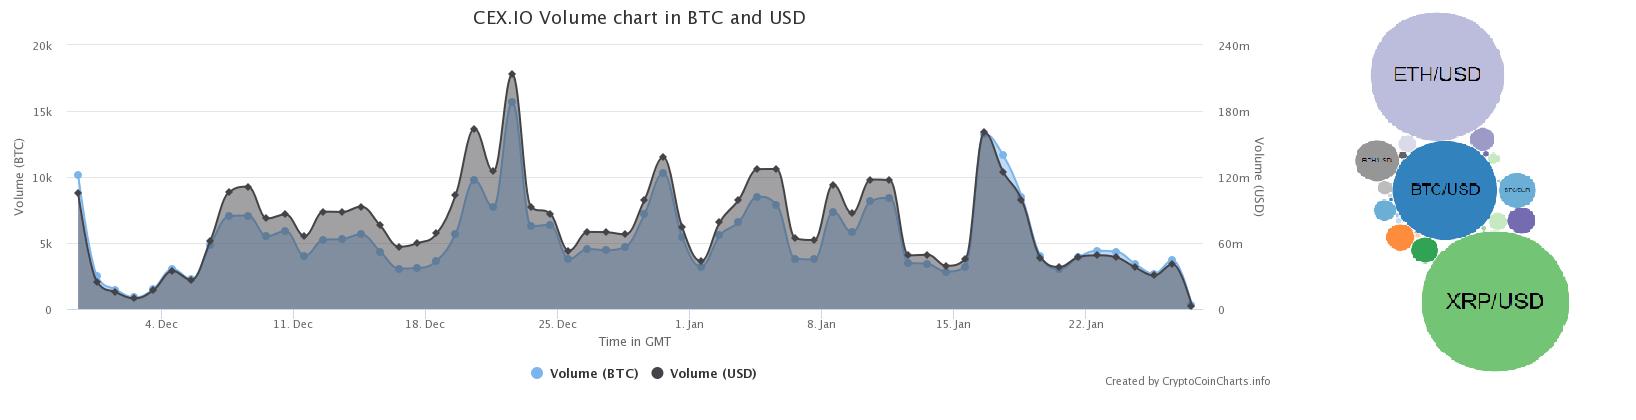 CEX Exchange Information Chart